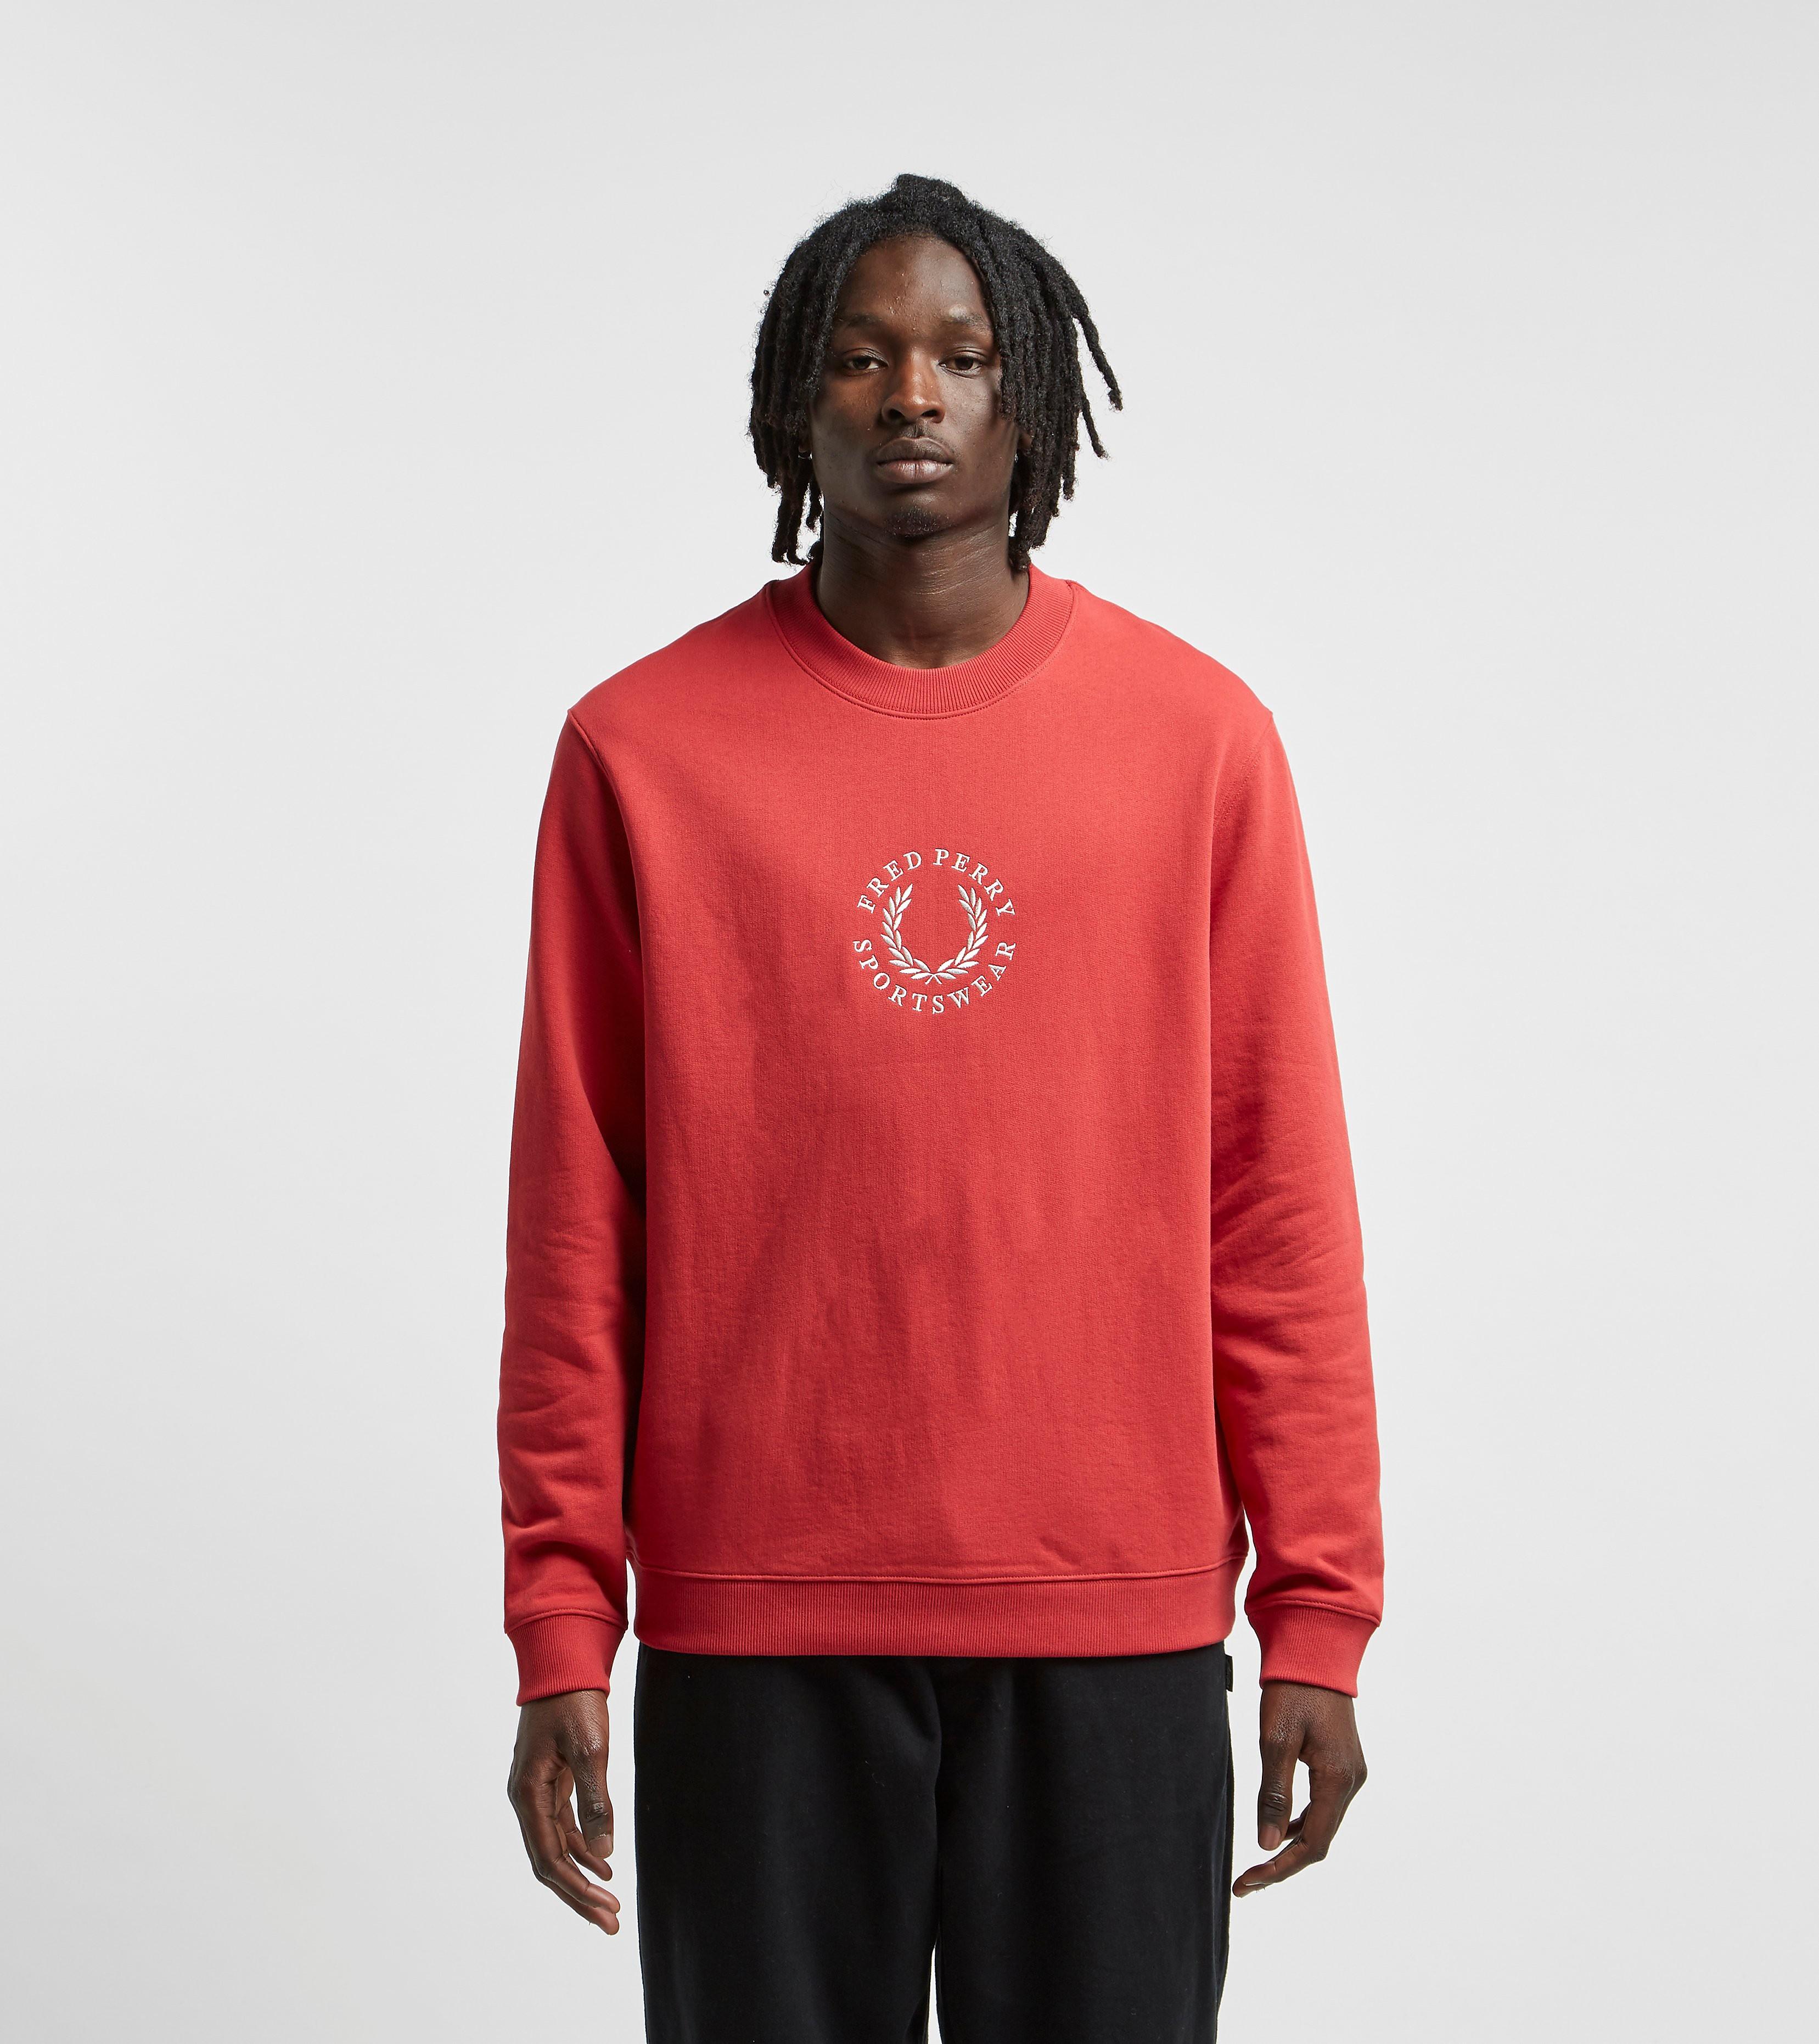 Fred Perry Global Branded Sweatshirt Red